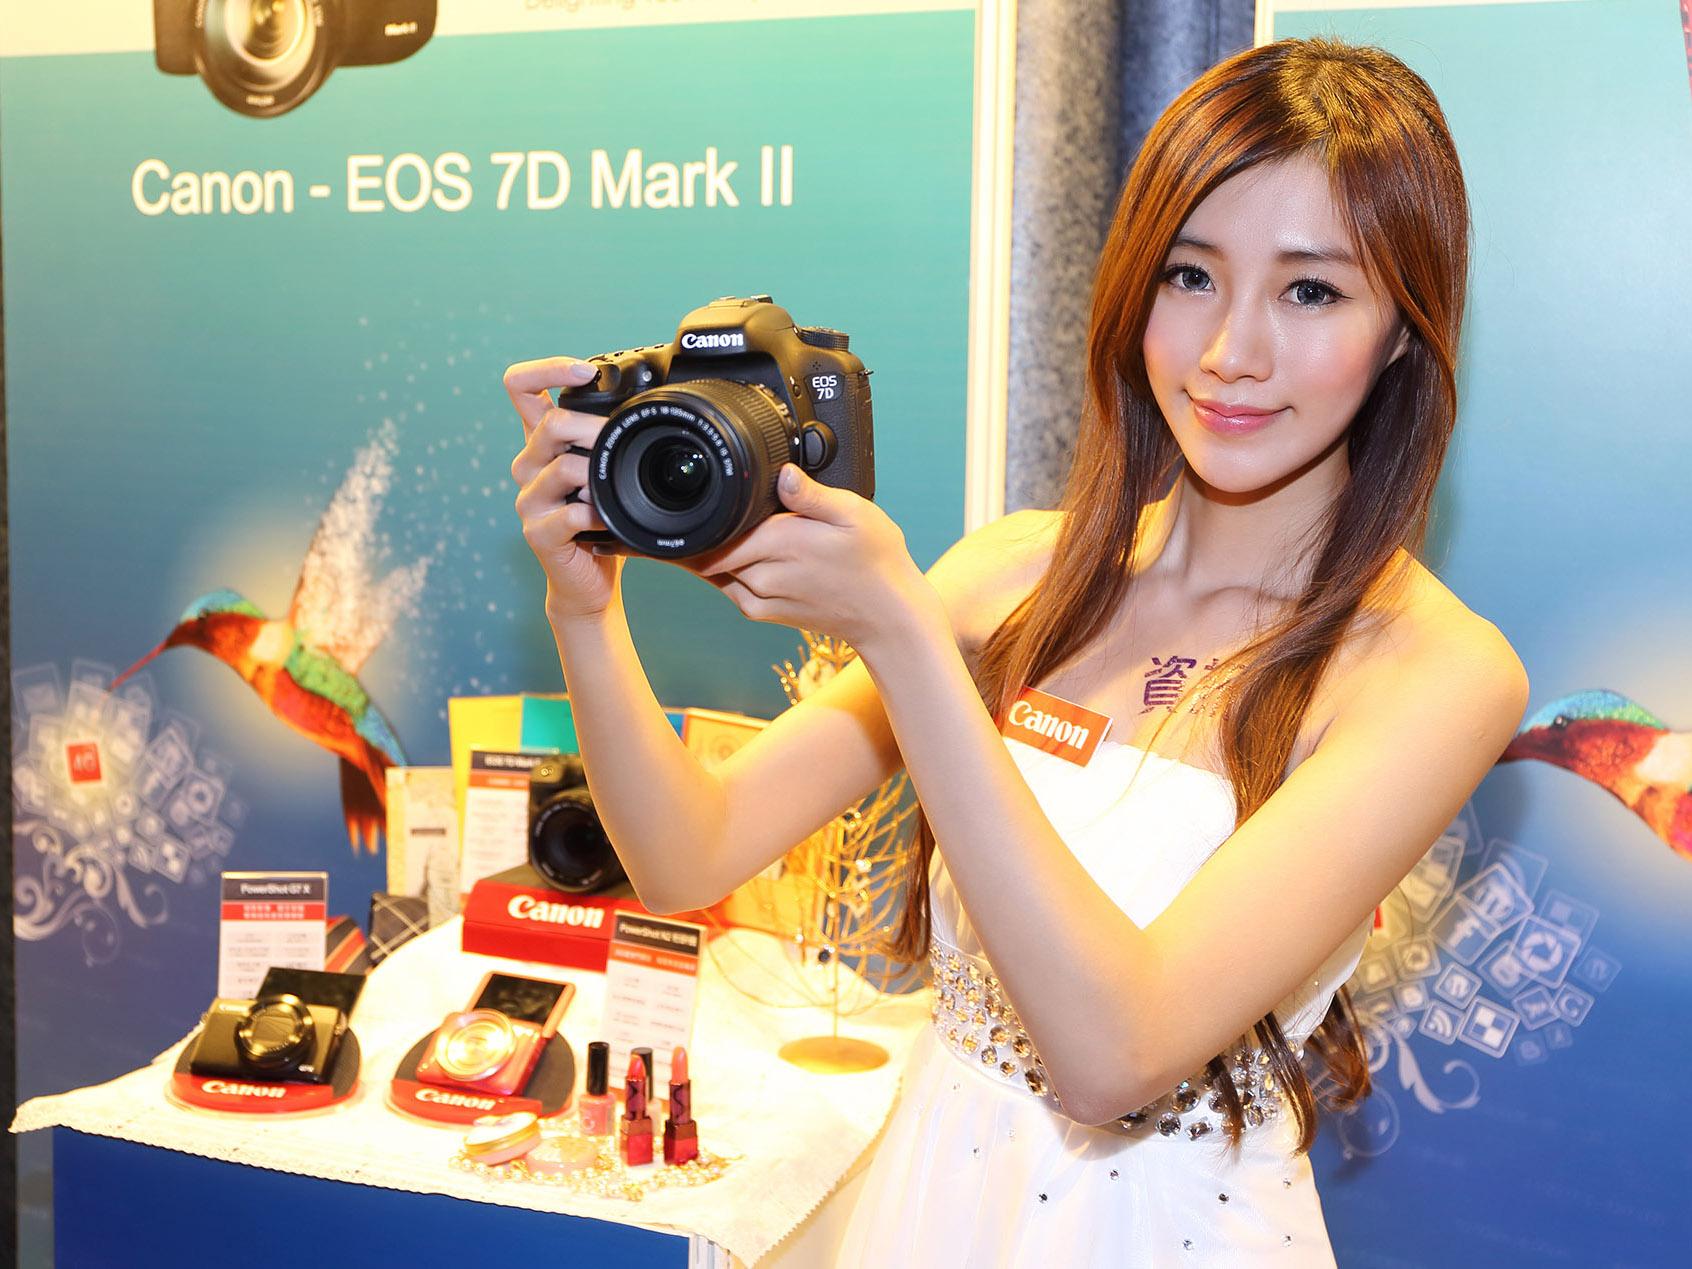 103資訊月 相機廠商優惠方案總整理(Nikon、Canon、Sony、Olympus、Samsung、Ricoh/Pentax、Fujifilm)